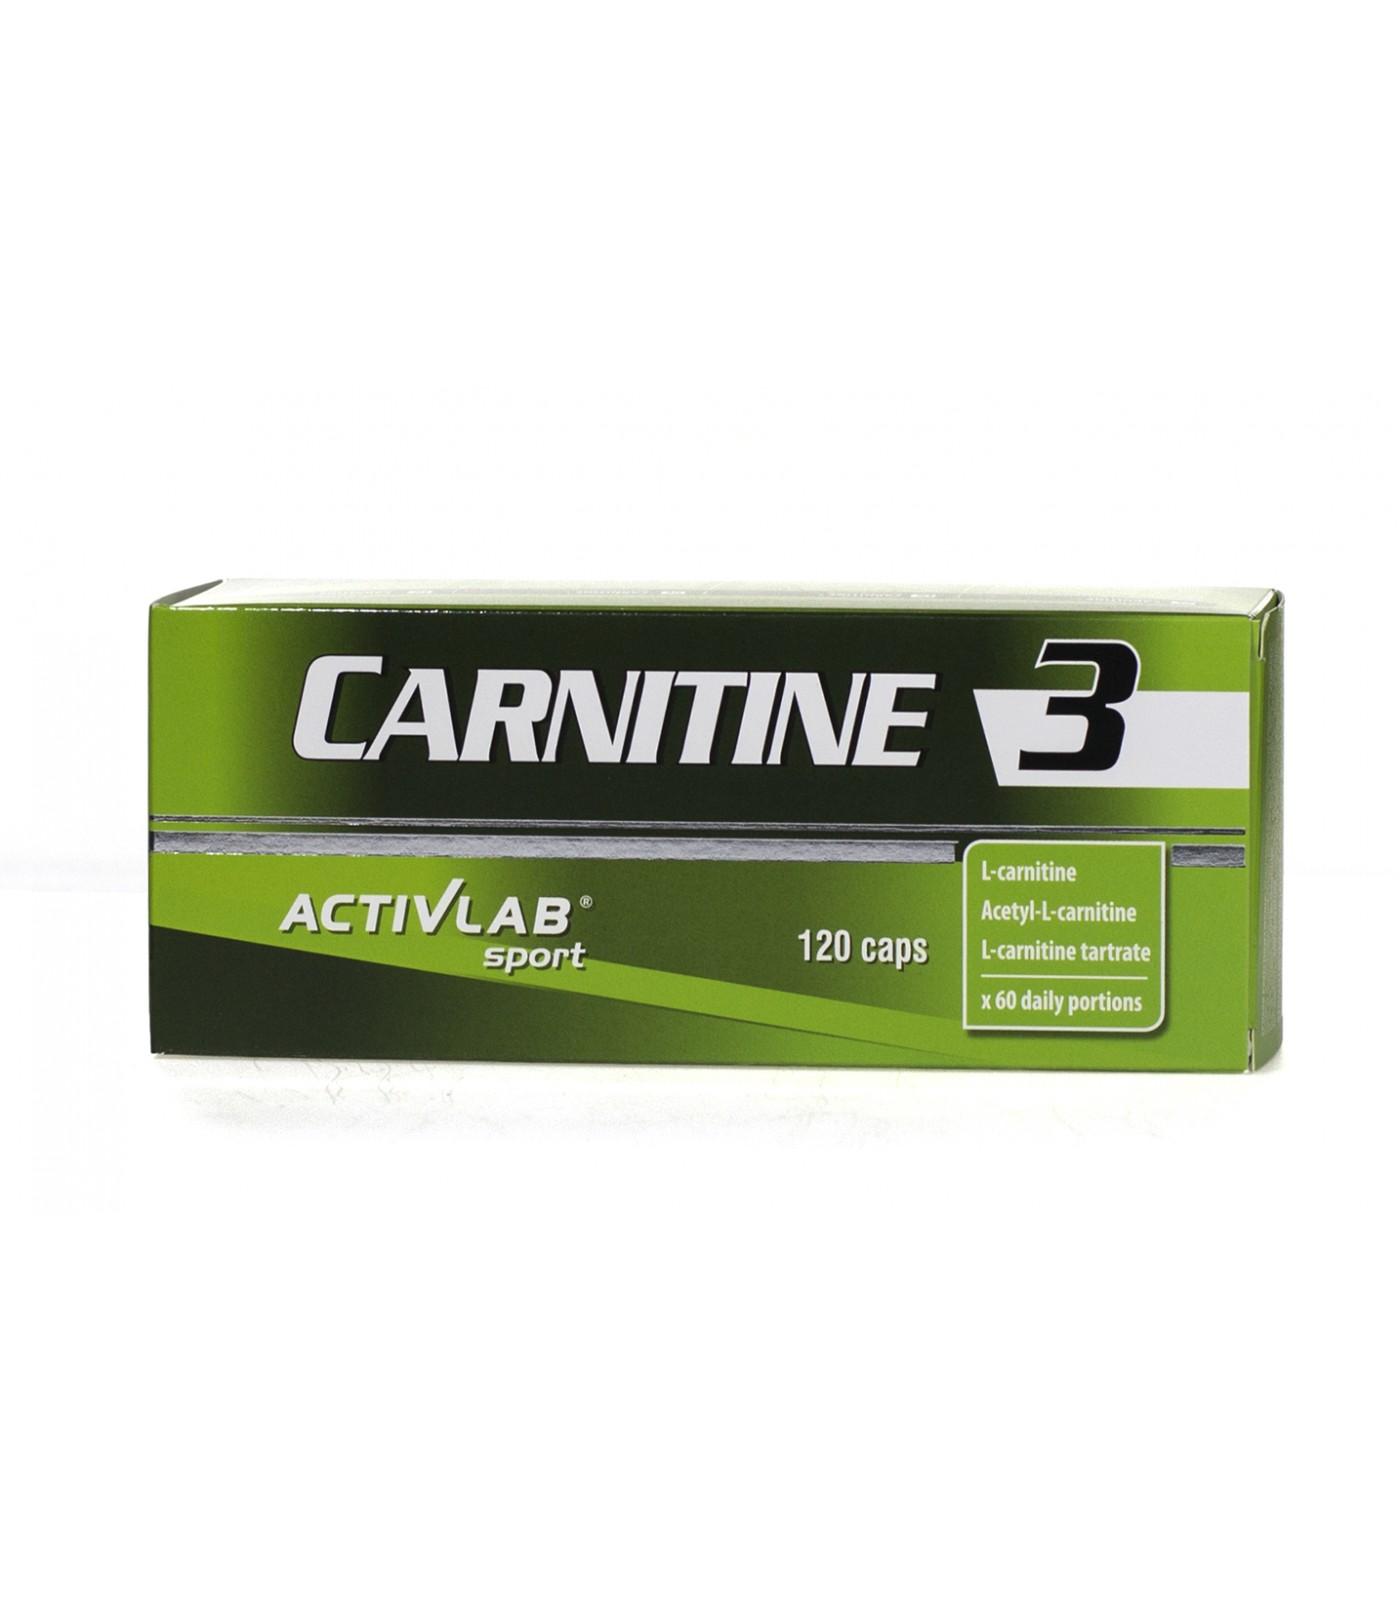 ActivLab - Carnitine 3 / 120caps.